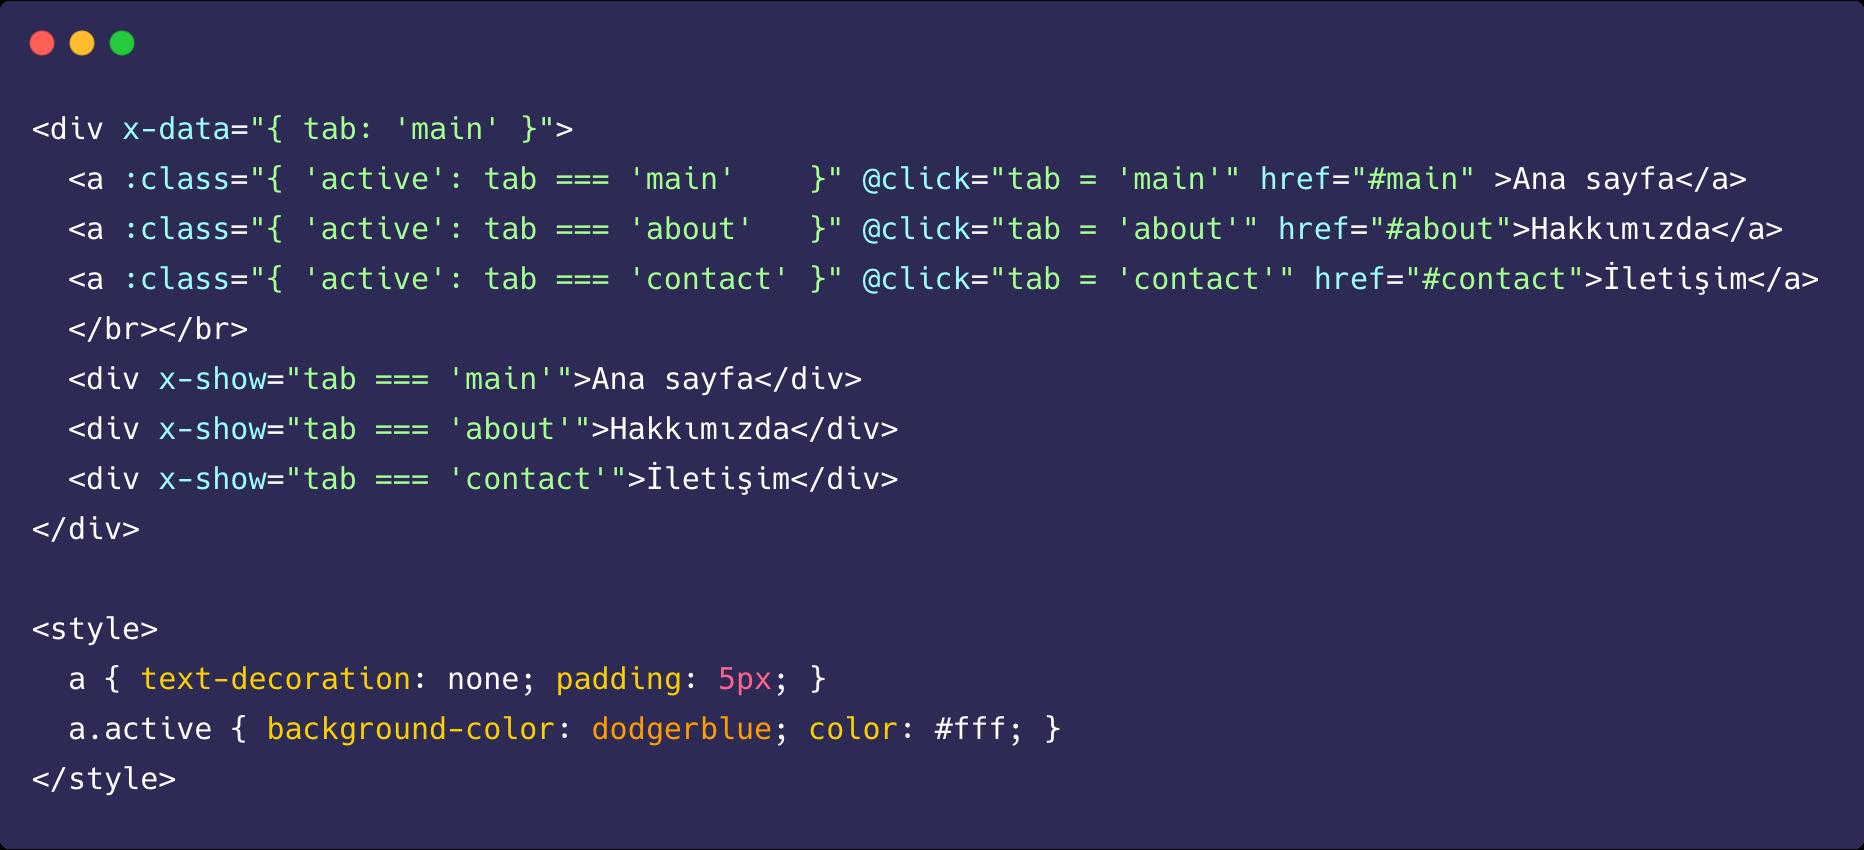 AlpineJS ile basit bir tab bileşeni yapımı. Kaynak: https://gist.github.com/ozcanzaferayan/4a95ff38b90afdb54b9e60f4723f59f1